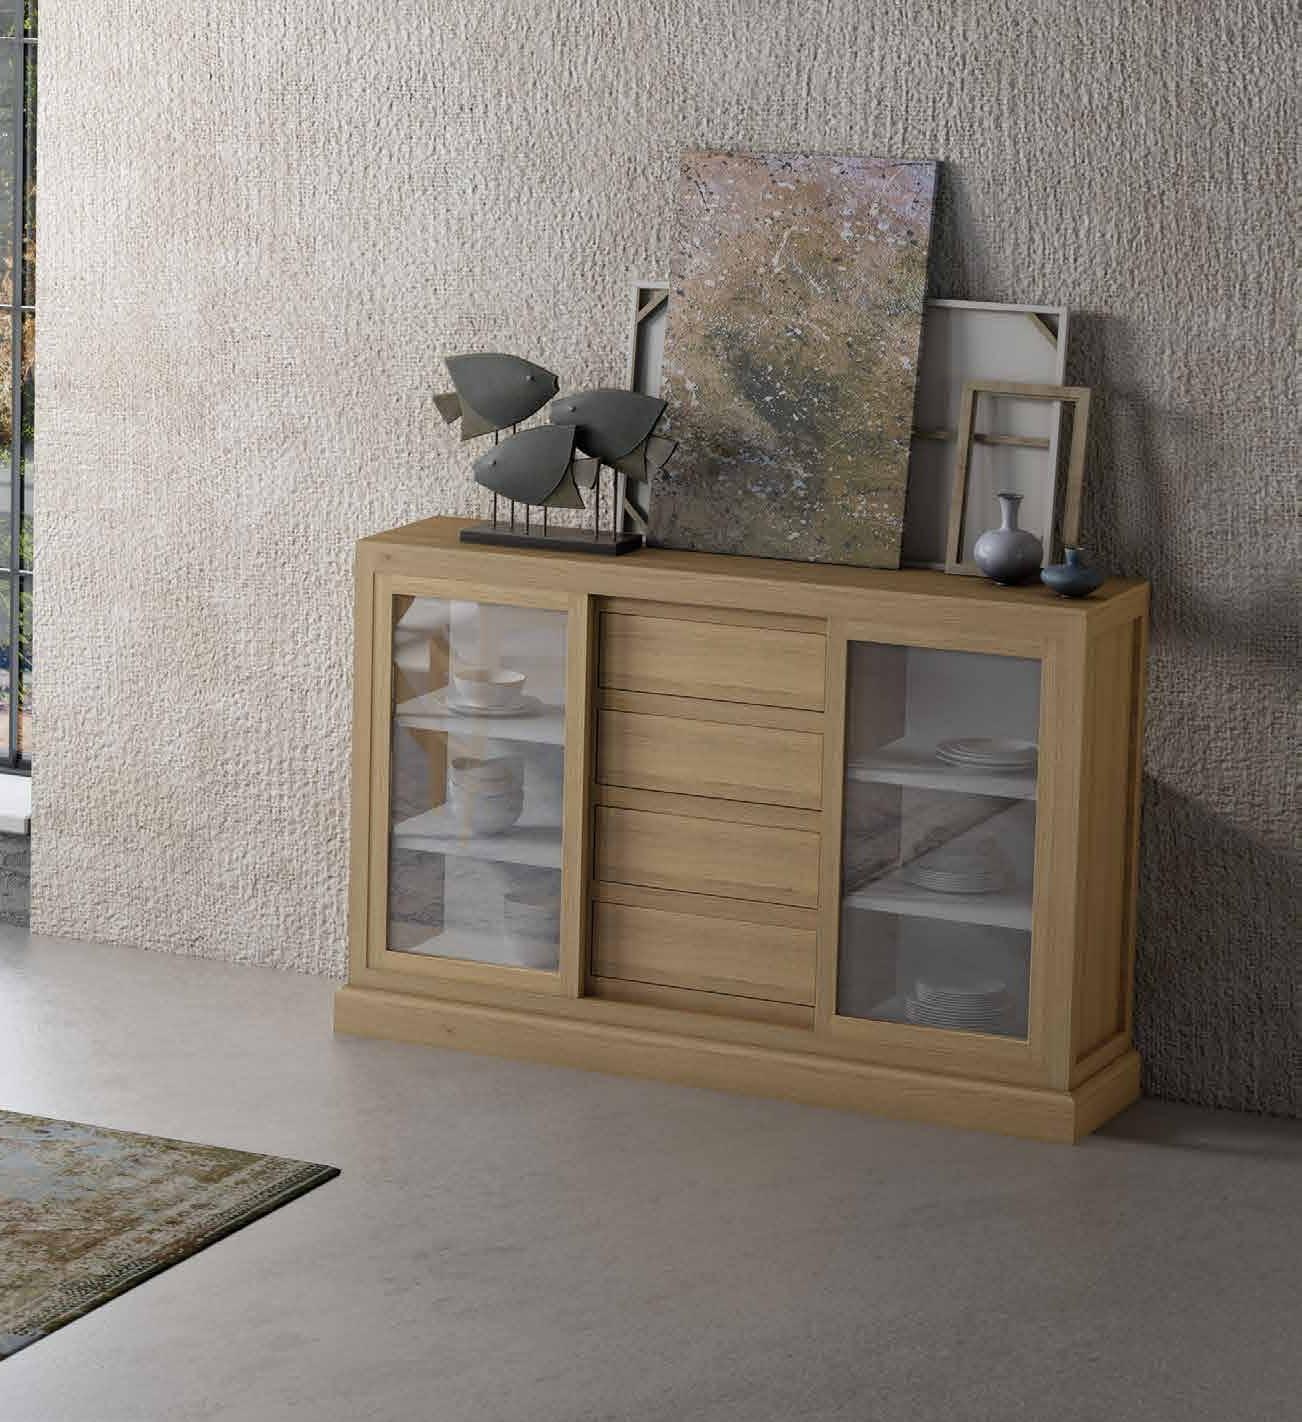 Aparador colección Terra AP07 - Aparador colección Terra AP07, Fabricado en madera de excelente calidad